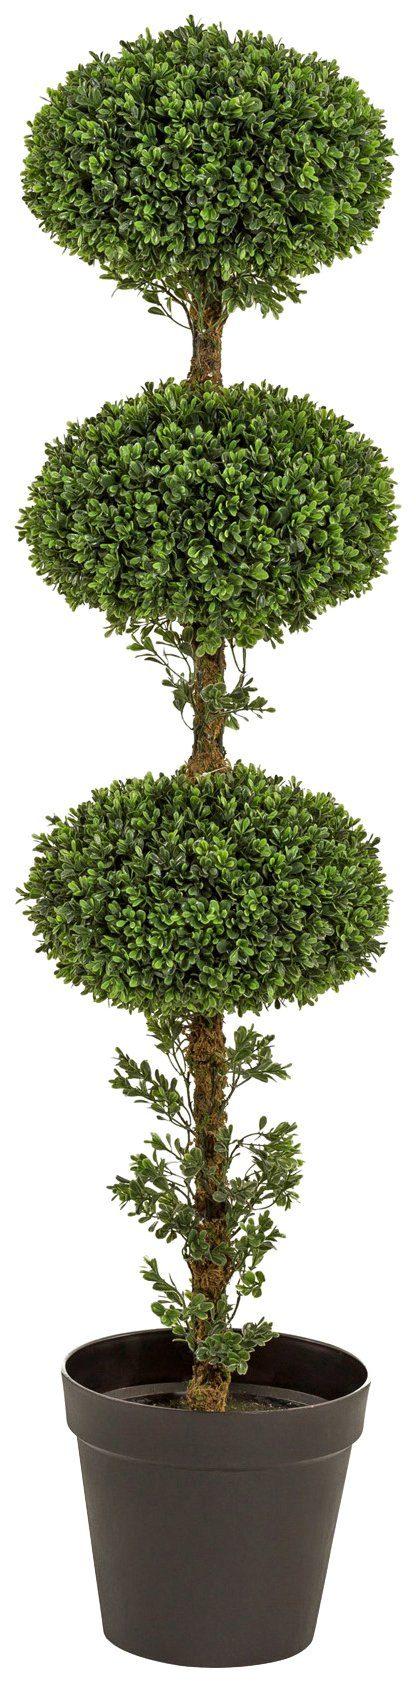 Kunstpflanze »Buchskugelbaum«, im Kunststofftopf, ØxH: 30x145 cm